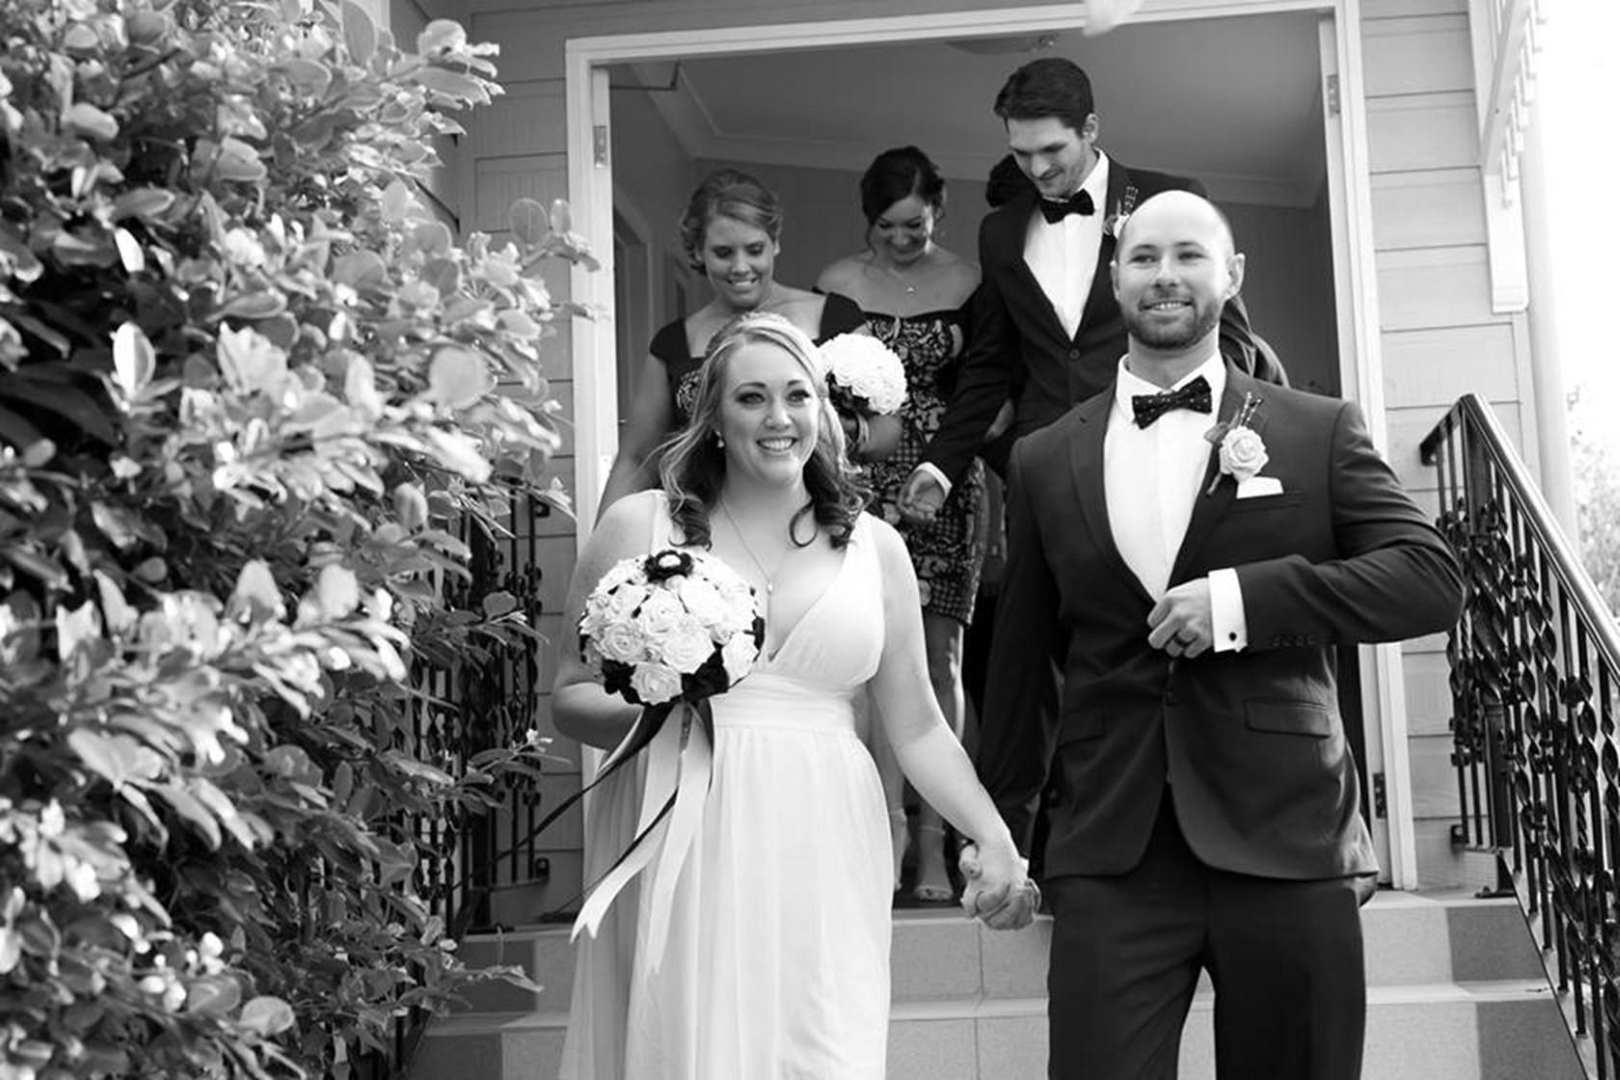 Wedding Venue - Darling St Chapel 3 on Veilability